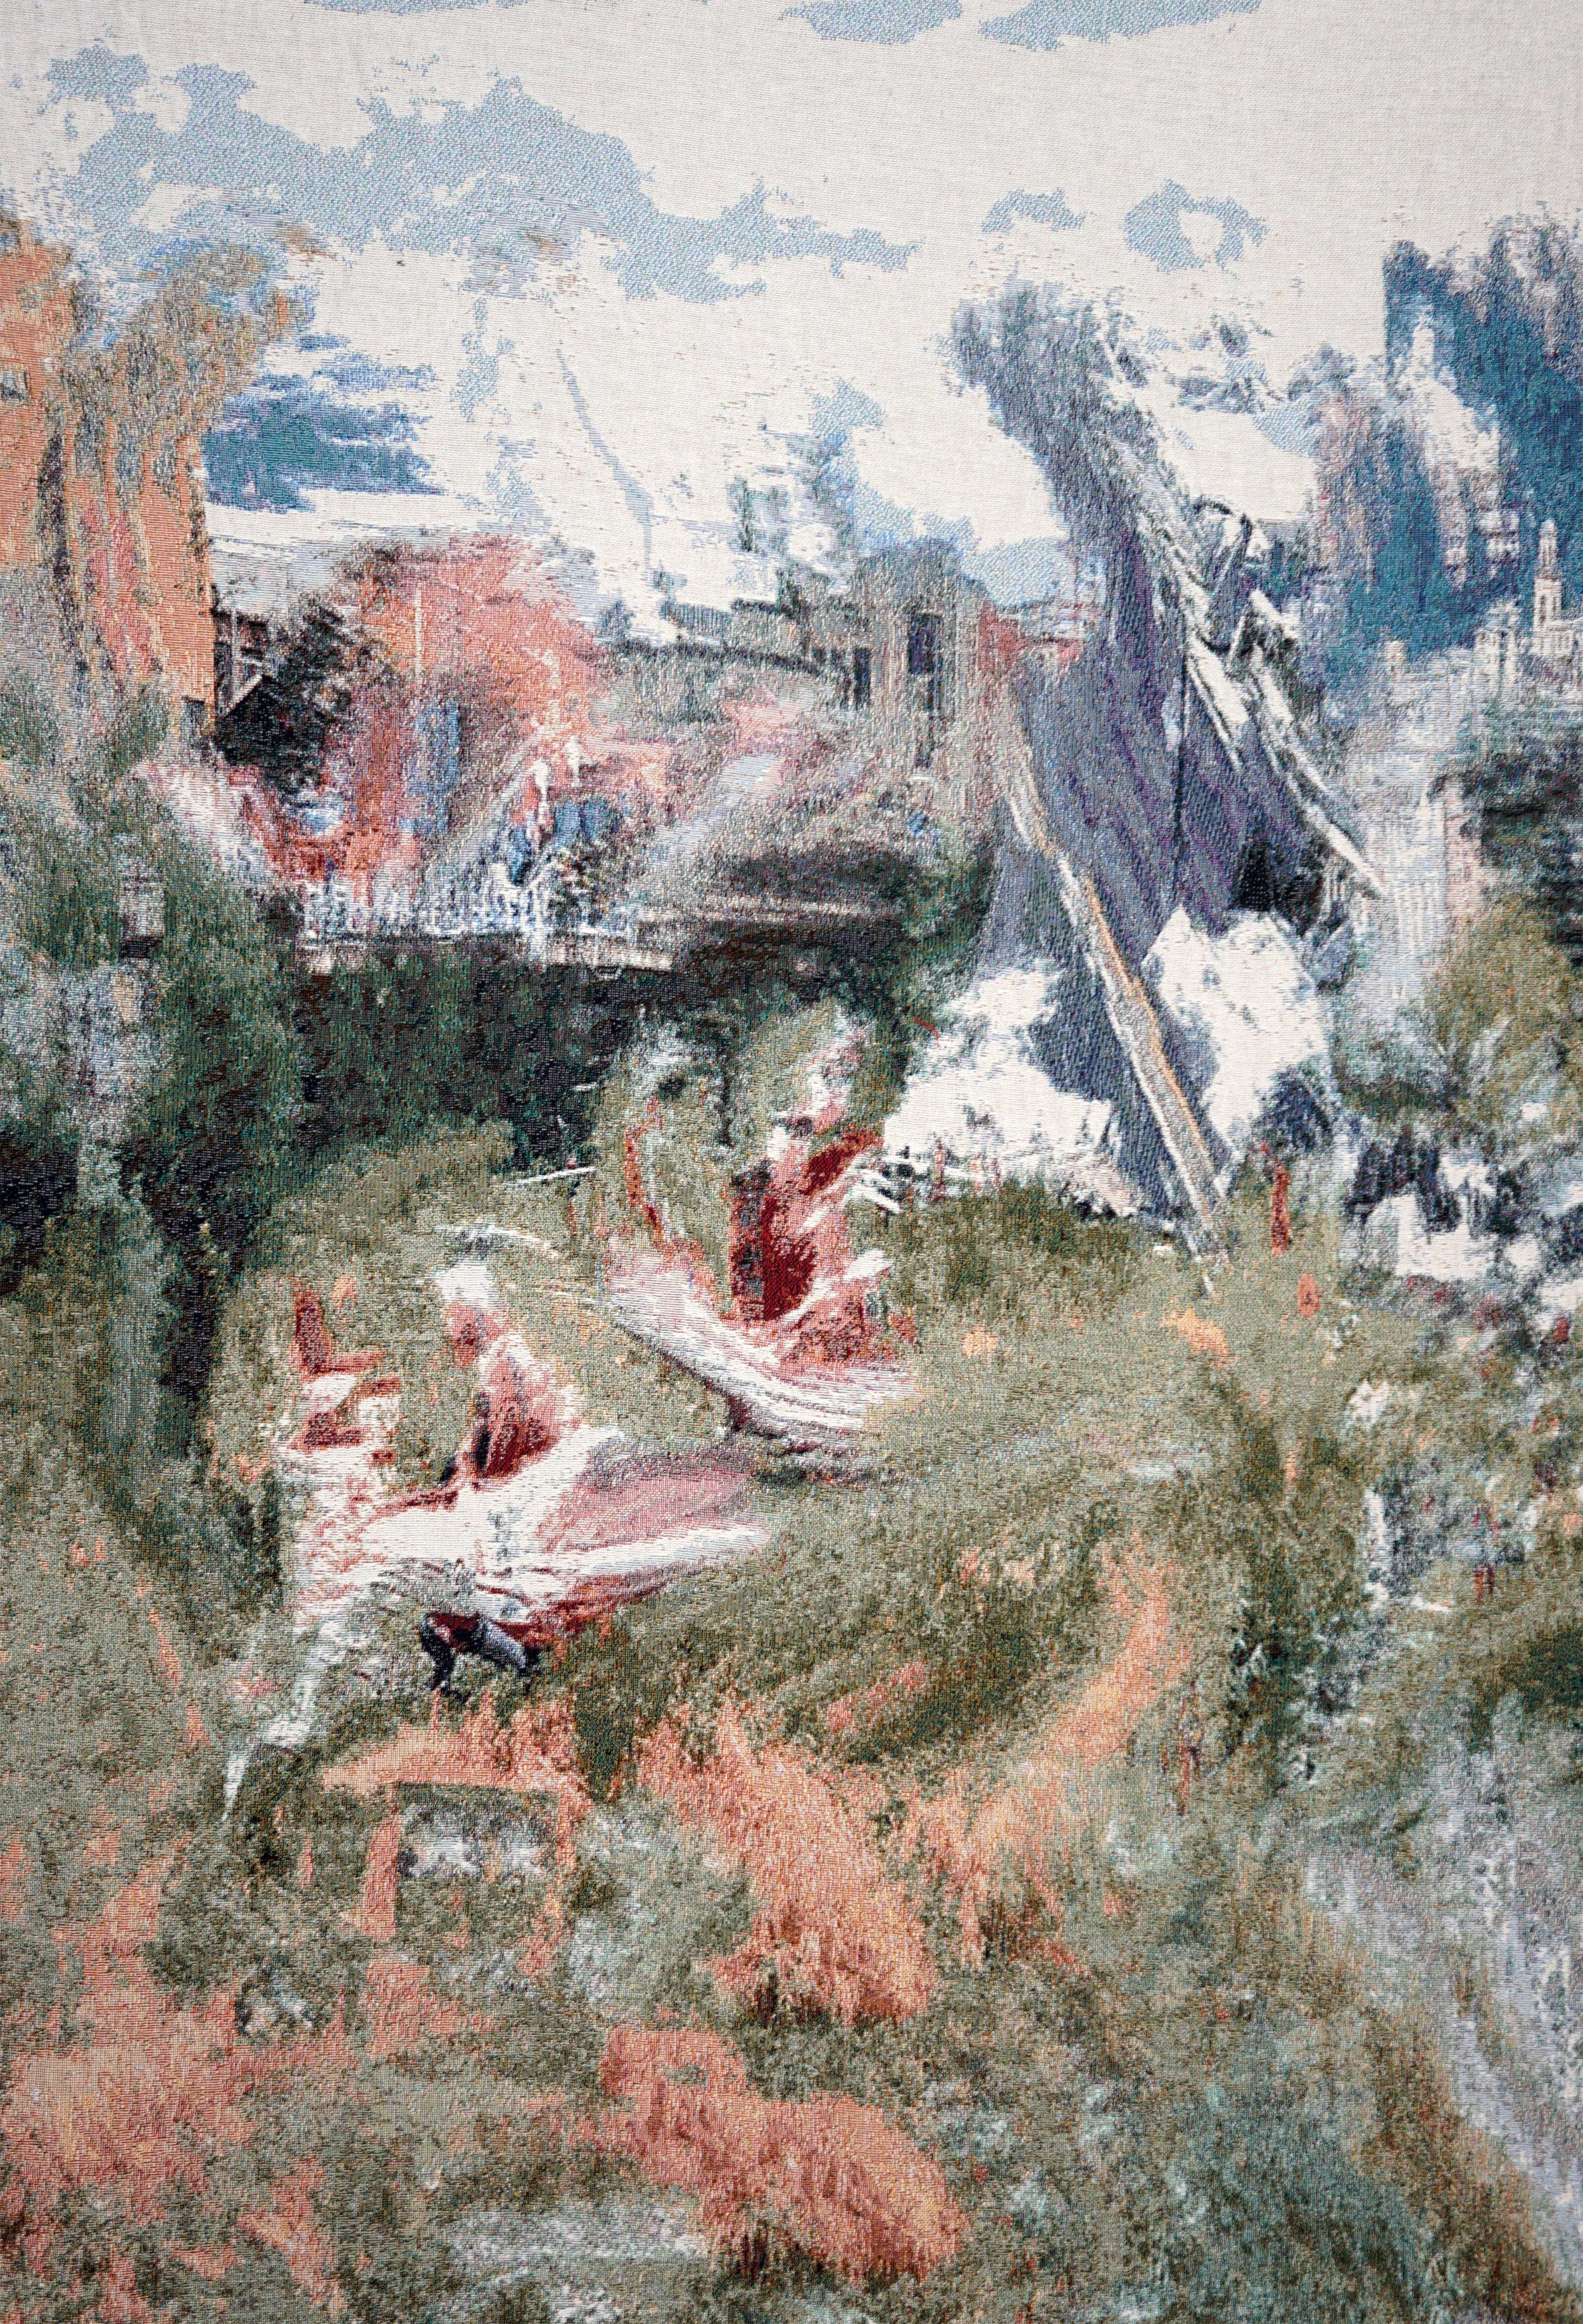 RY DAVID BRADLEY  *Ez_tC6d , 2018 Dye Cotton Tapestry  190cm x 140cm